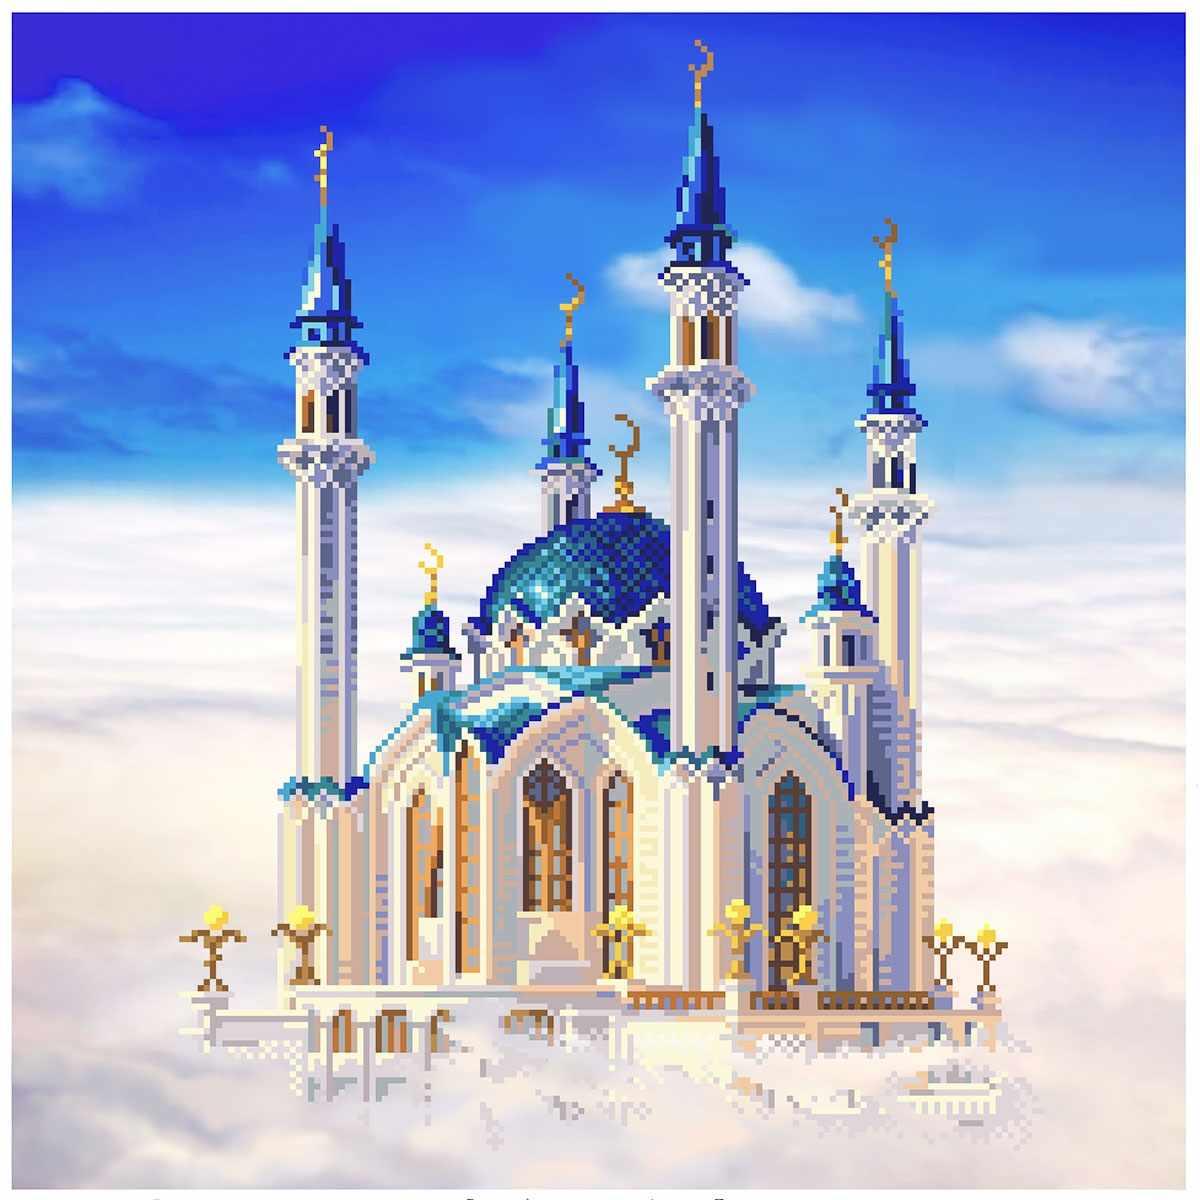 1798 Мечеть Кул-Шериф в Казани - рисунок на канве (МП)